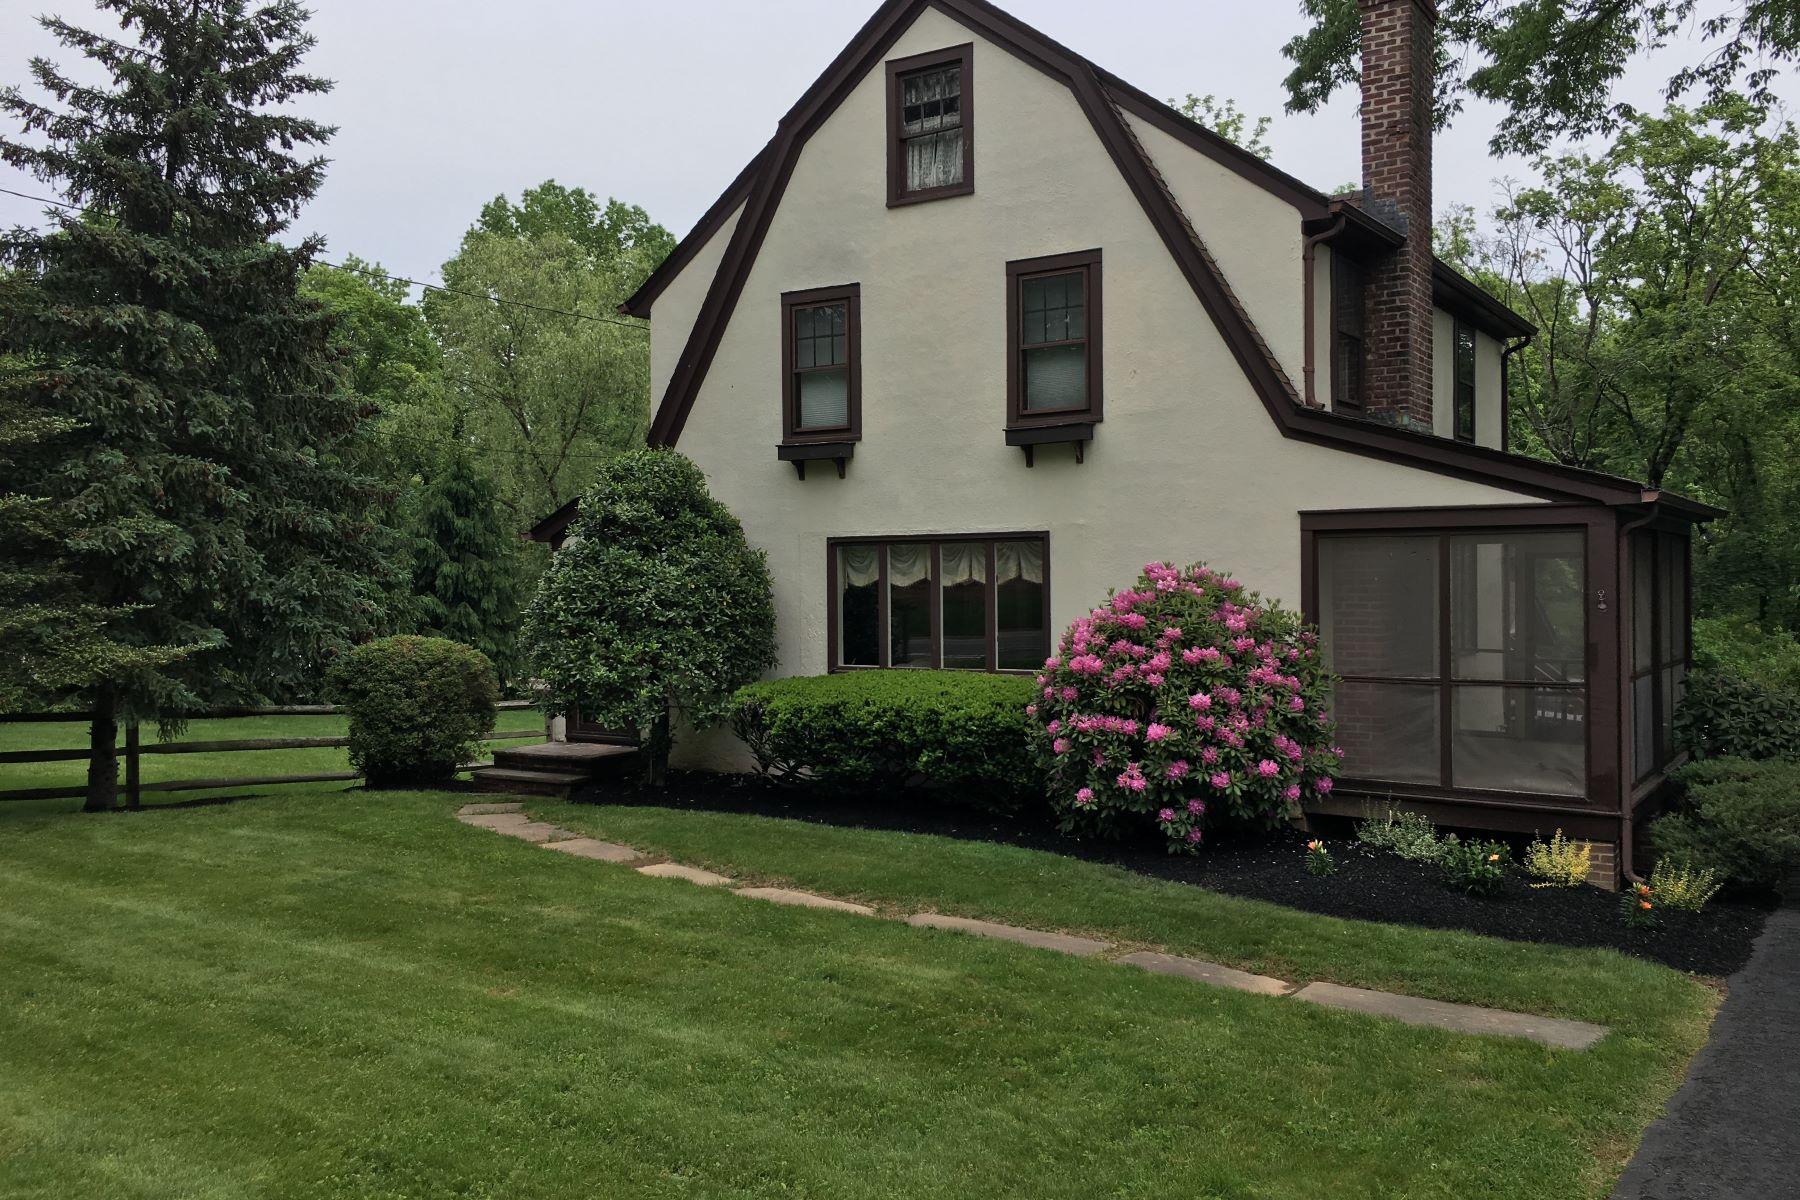 独户住宅 为 销售 在 Charming Colonial Tudor 512 Lyons Road Bernards Township, 新泽西州 07920 美国